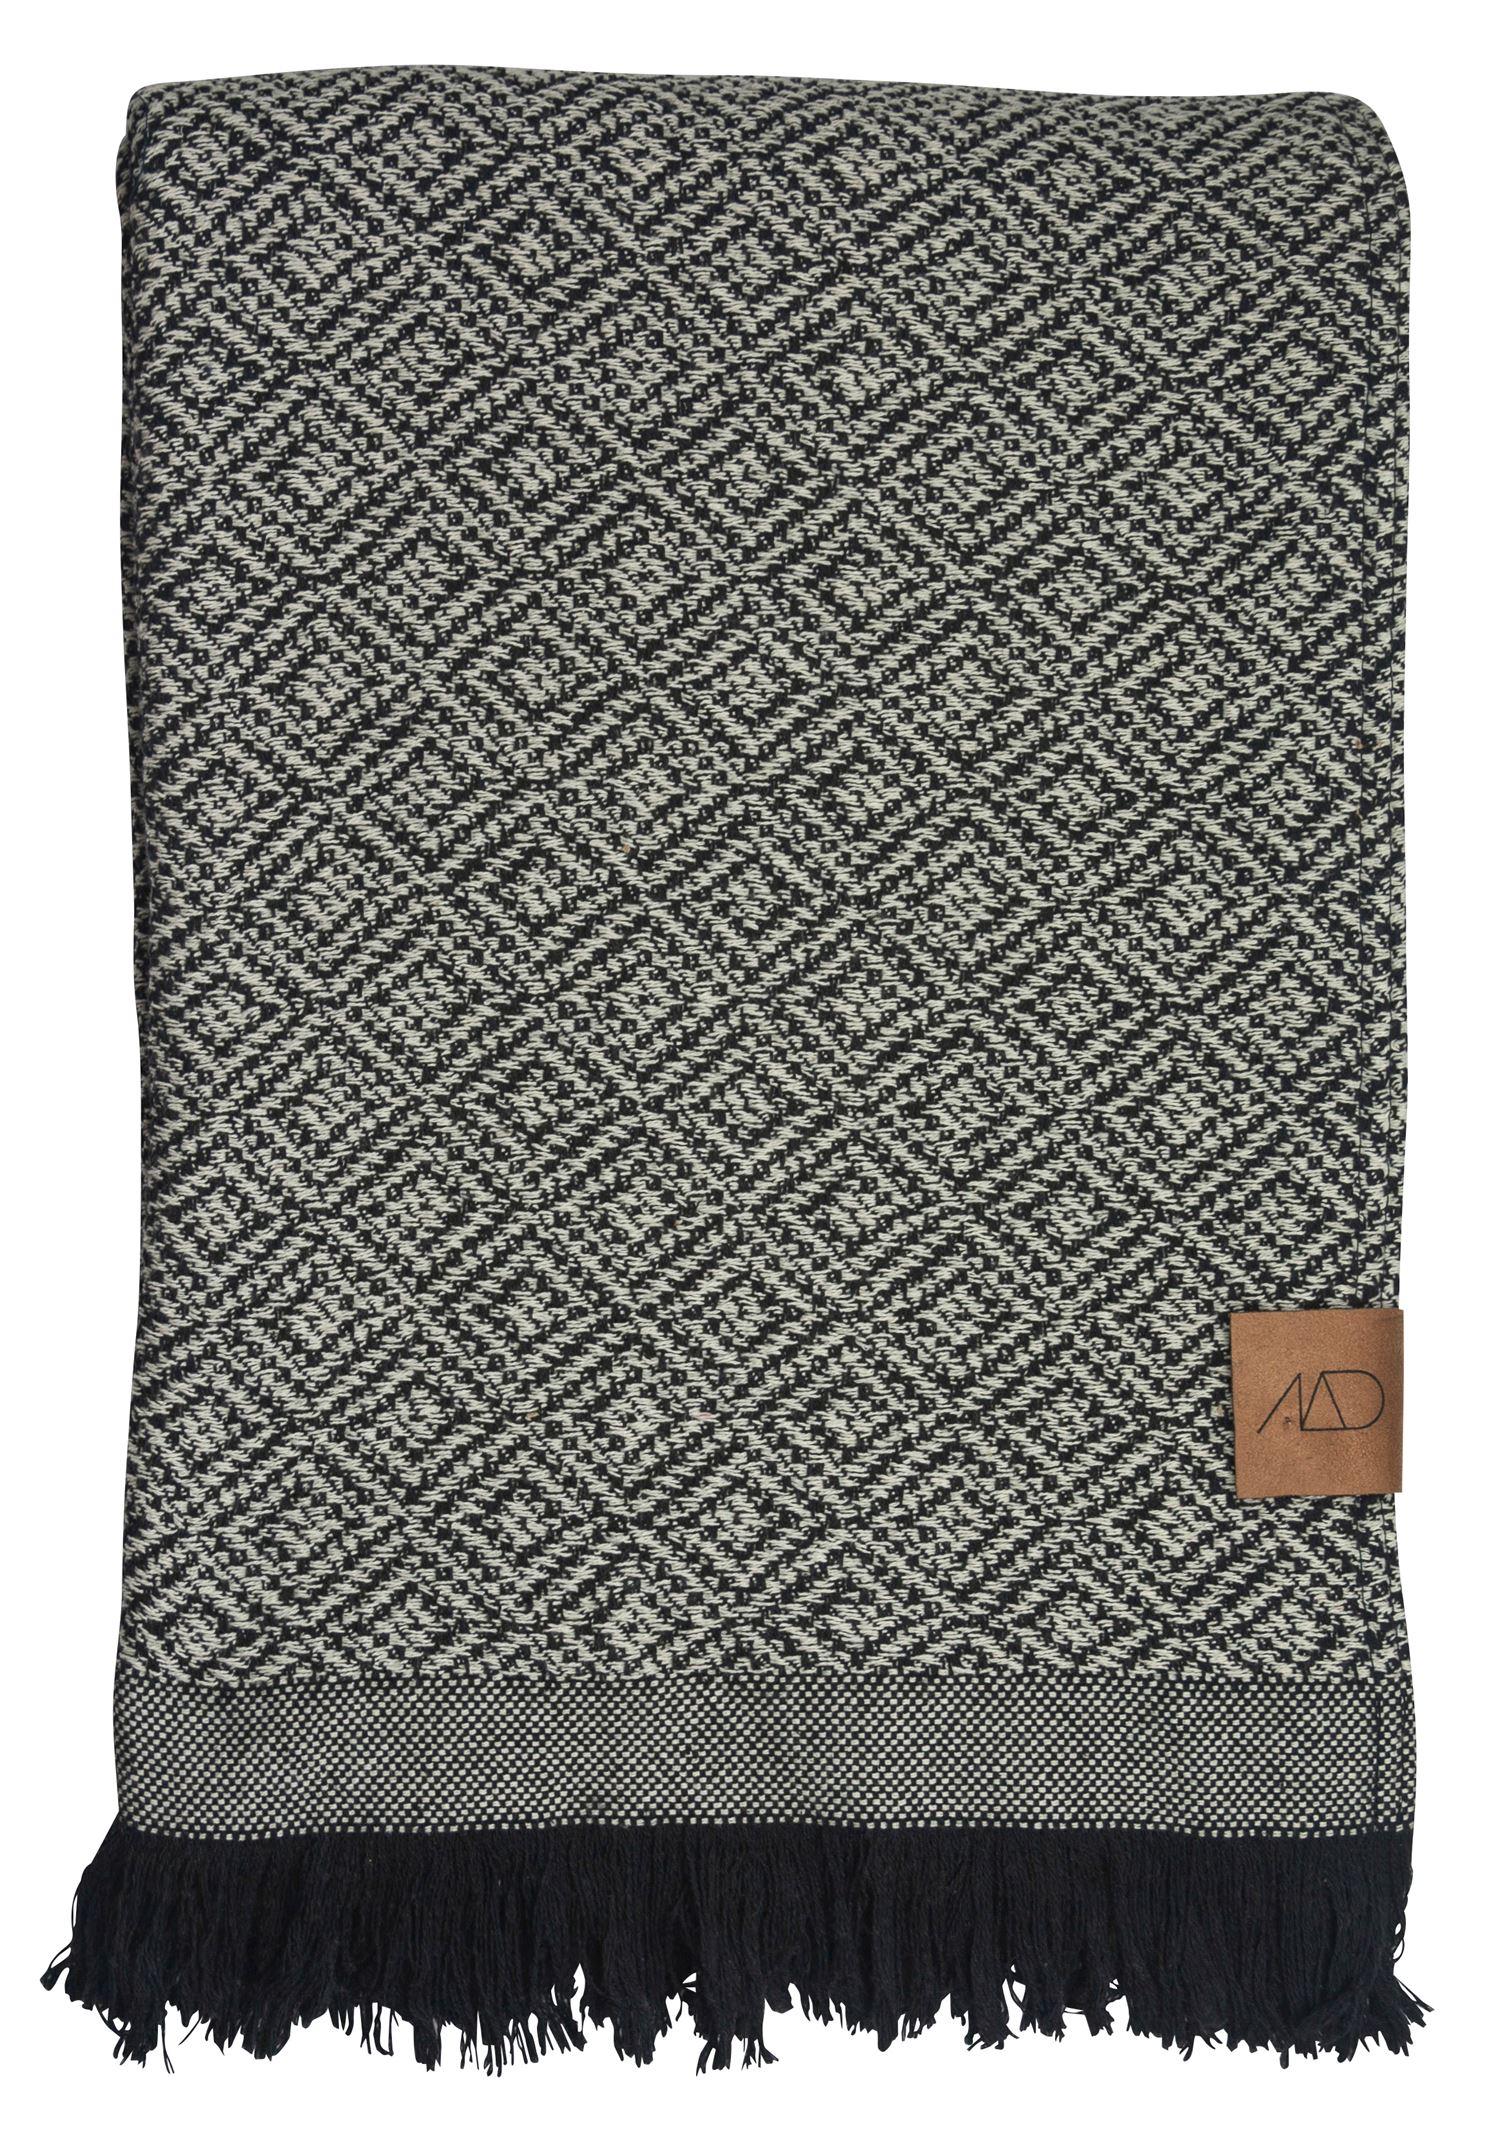 Mette Ditmer Mezzoforte Throw plaid, 120x175 cm